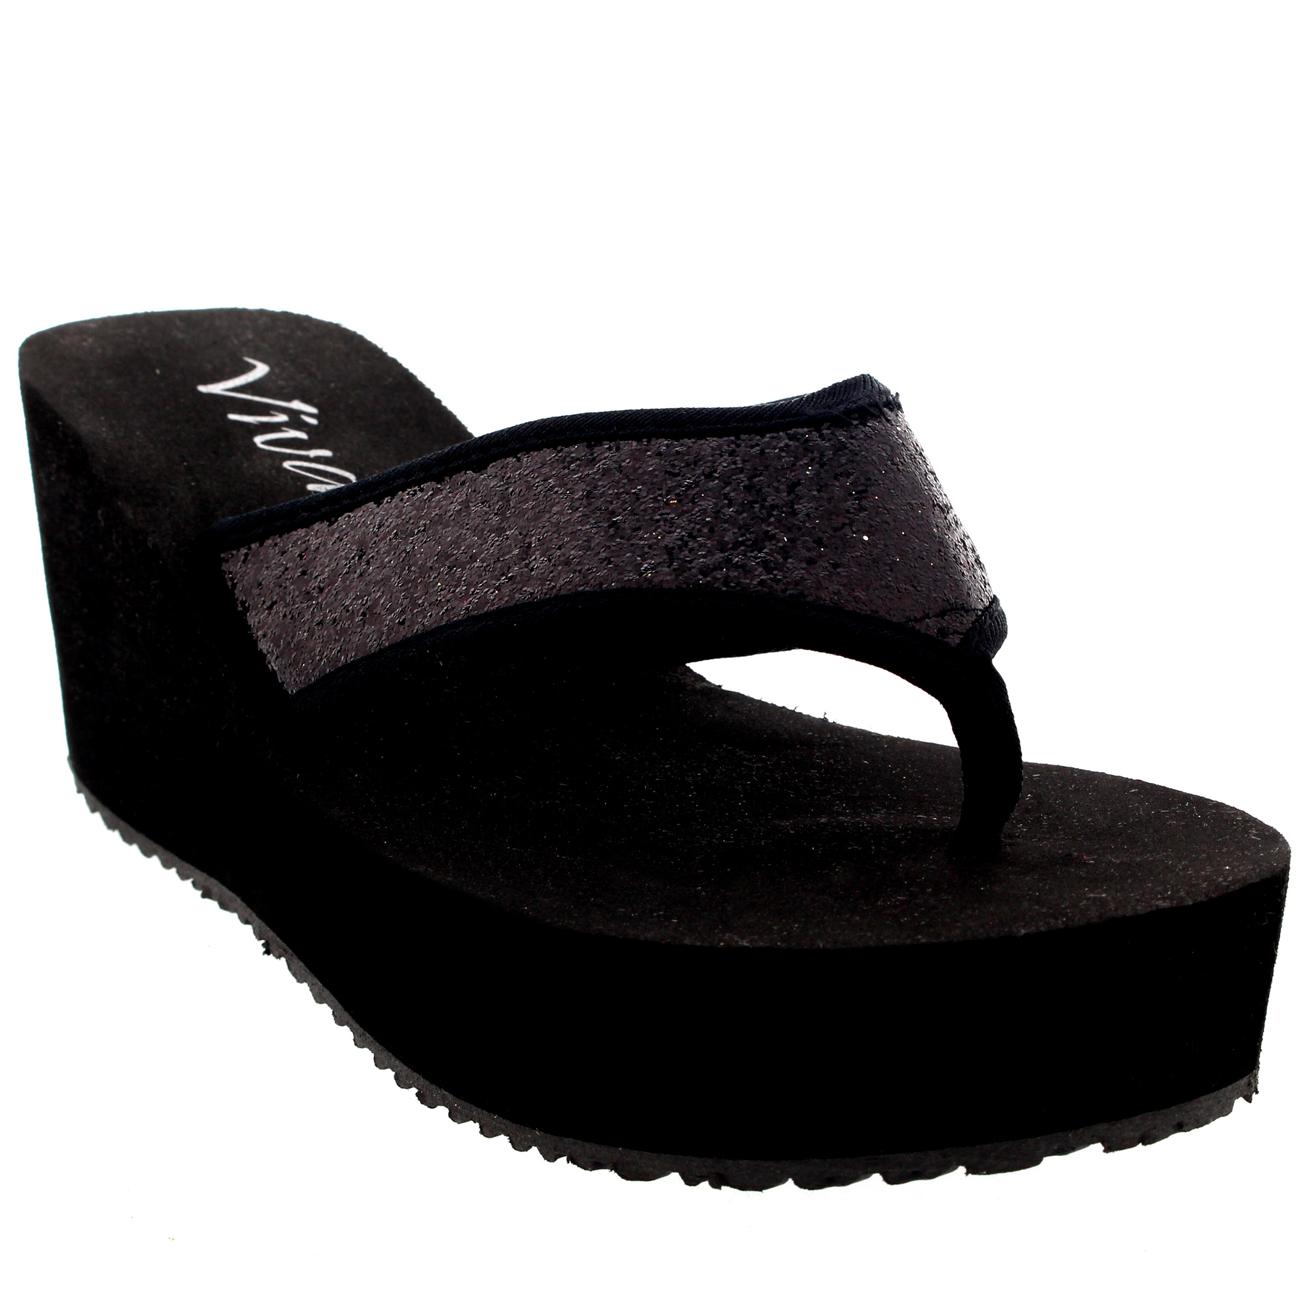 damen offene zehen flip flops glitzer high heel plateau keilabsatz tanga sandalen uk 3 9 ebay. Black Bedroom Furniture Sets. Home Design Ideas